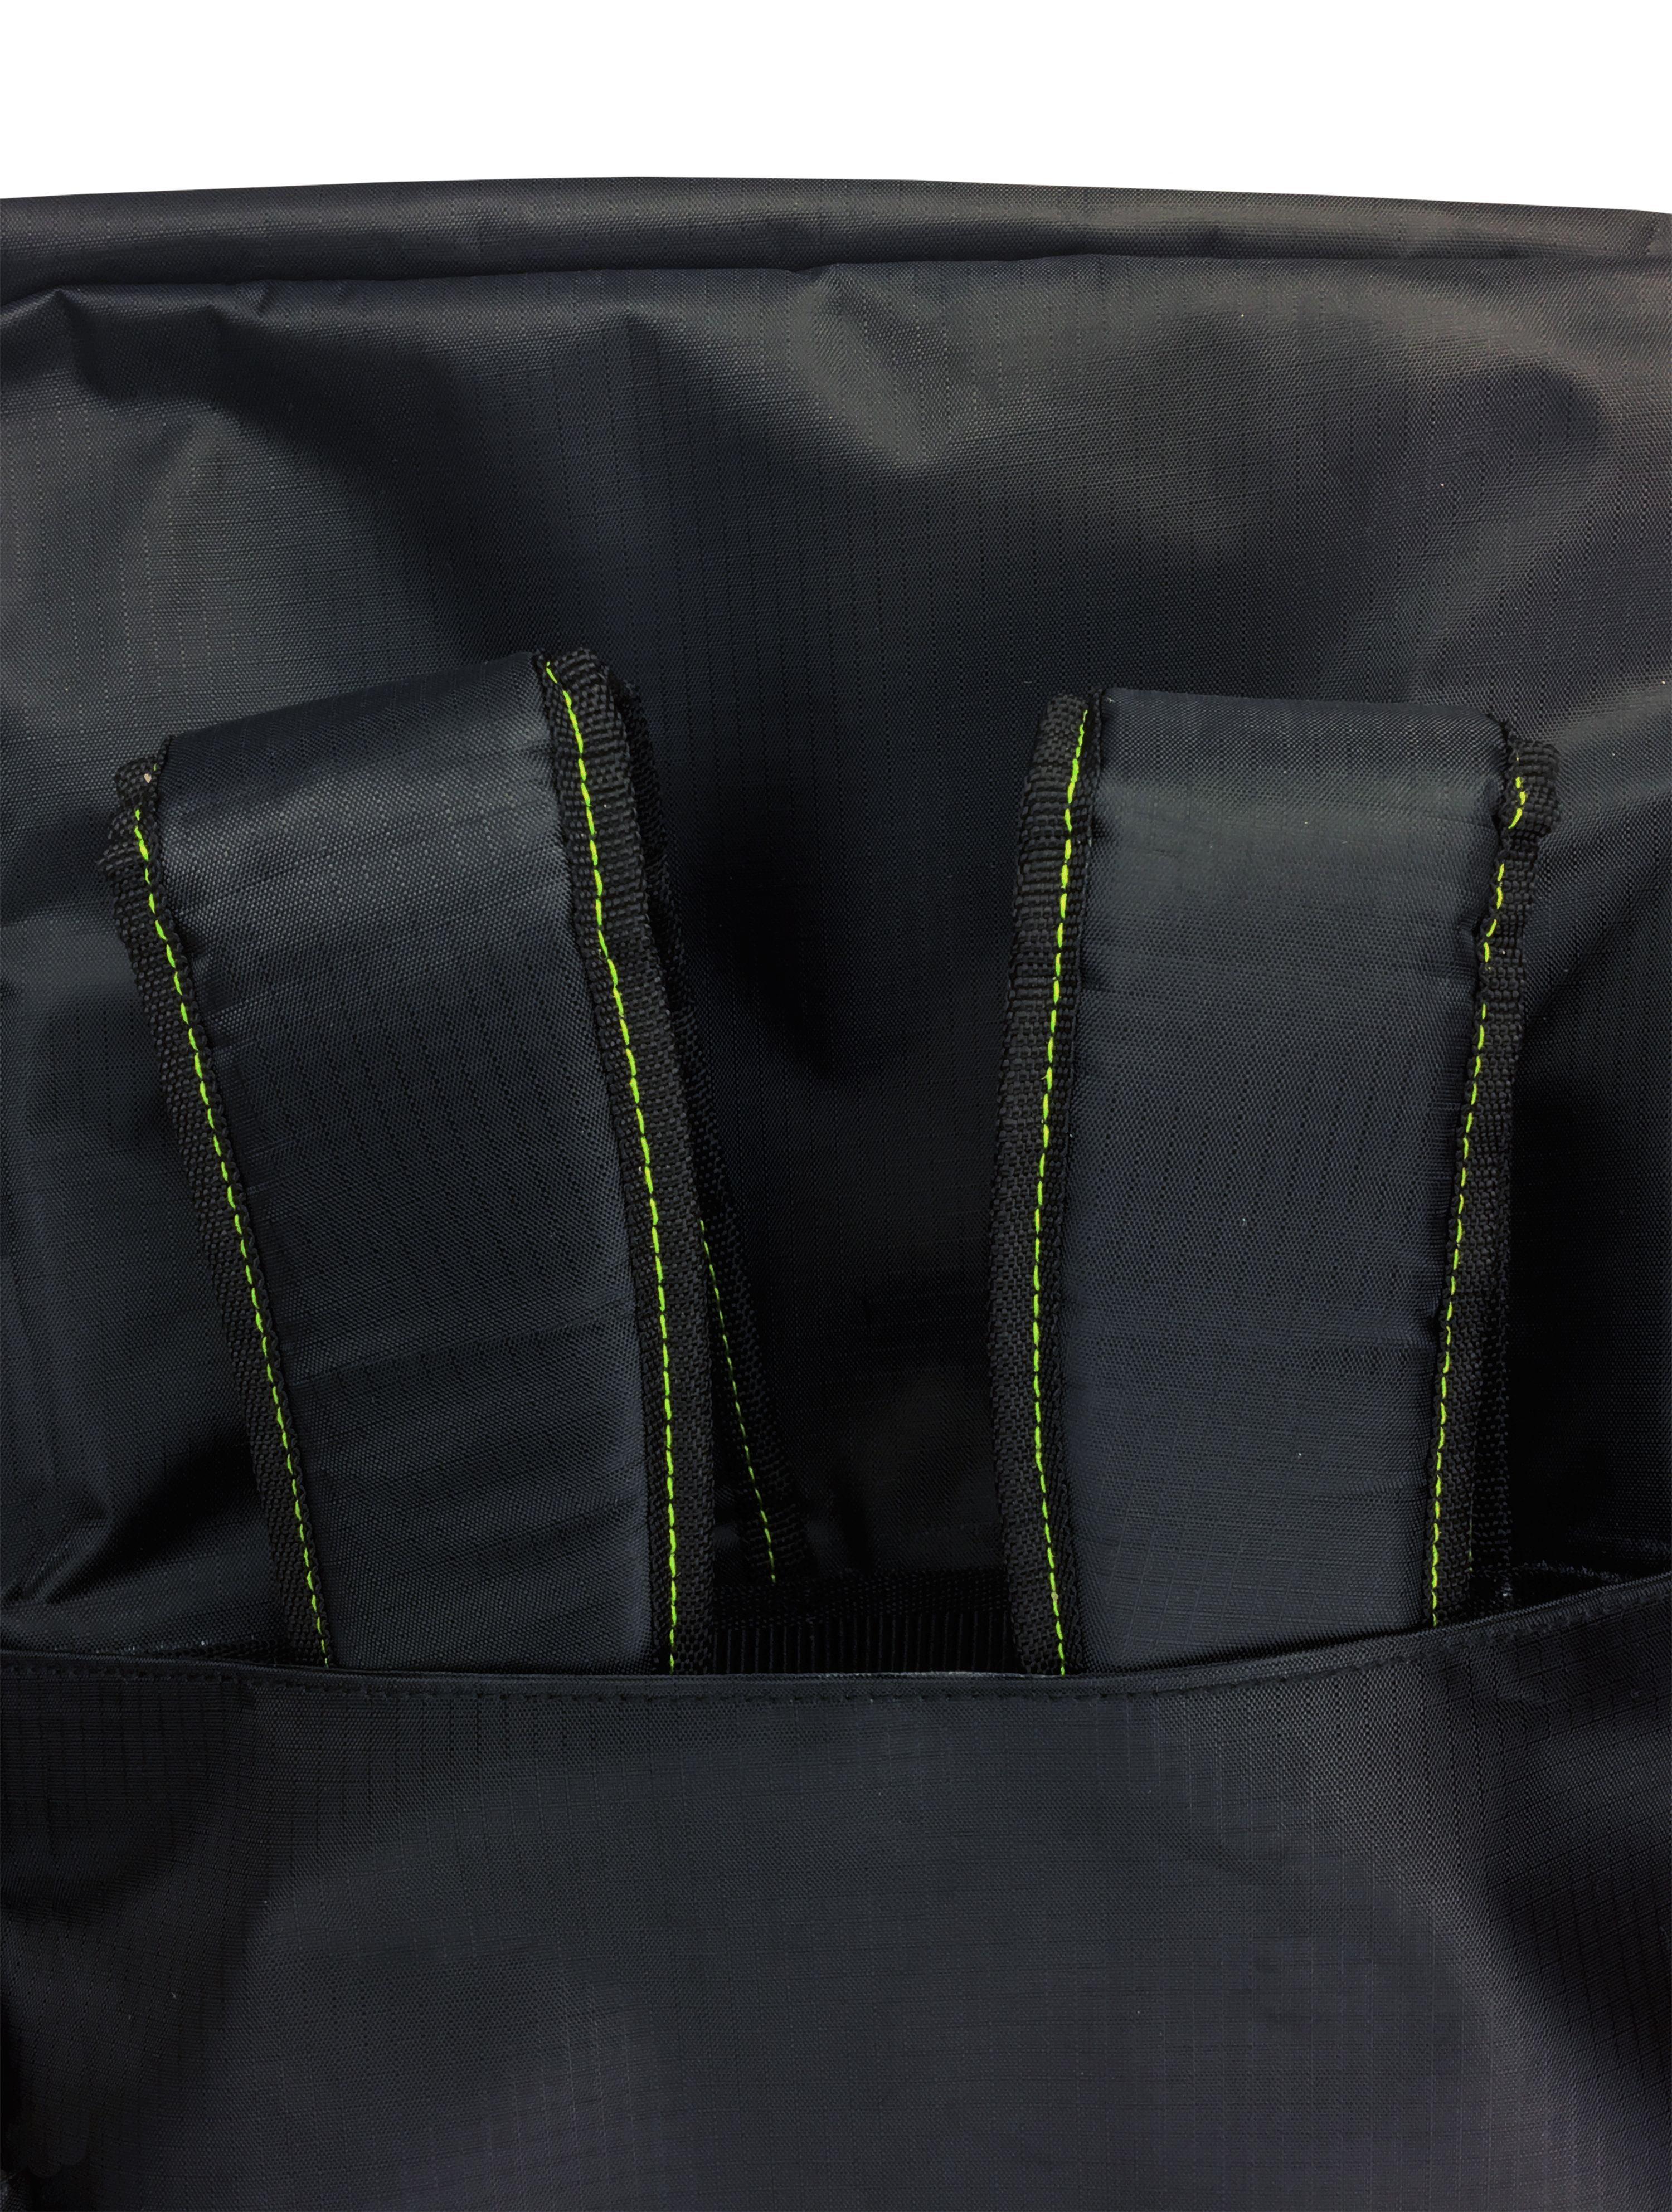 Flamingo Jungle White Mint Travel Duffel Bag Waterproof Fashion Lightweight Large Capacity Portable Luggage Bag